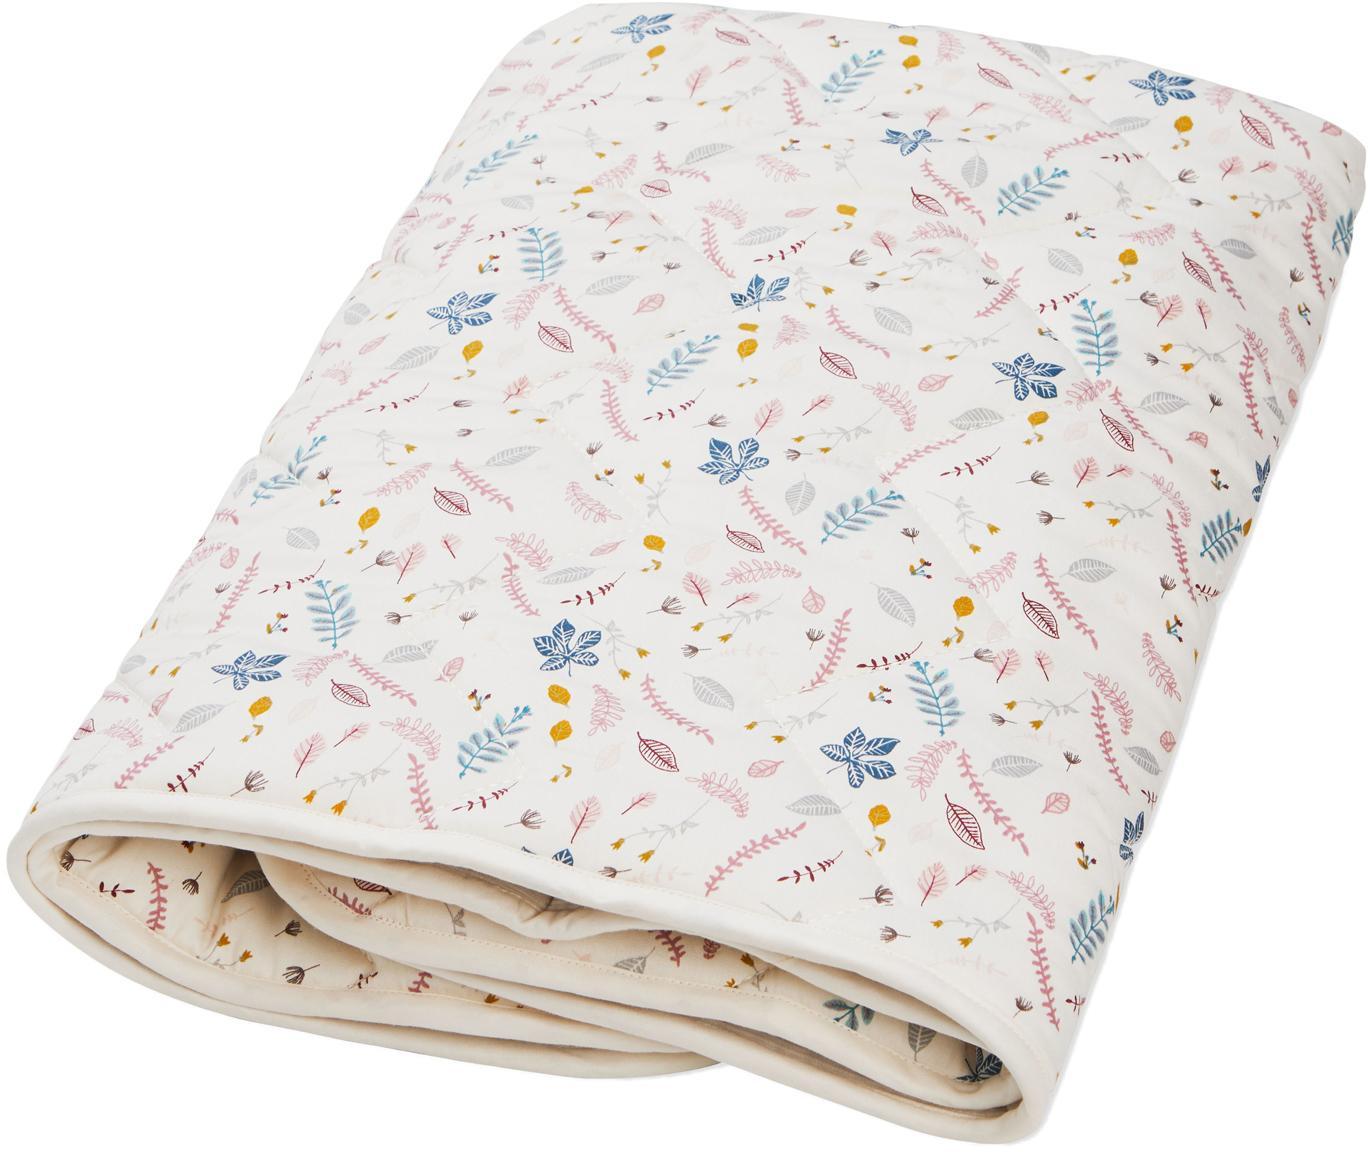 Manta Pressed Leaves, Tapizado: algodón orgánico, Crema, rosa, azul, gris, amarillo, An 100 x L 100 cm